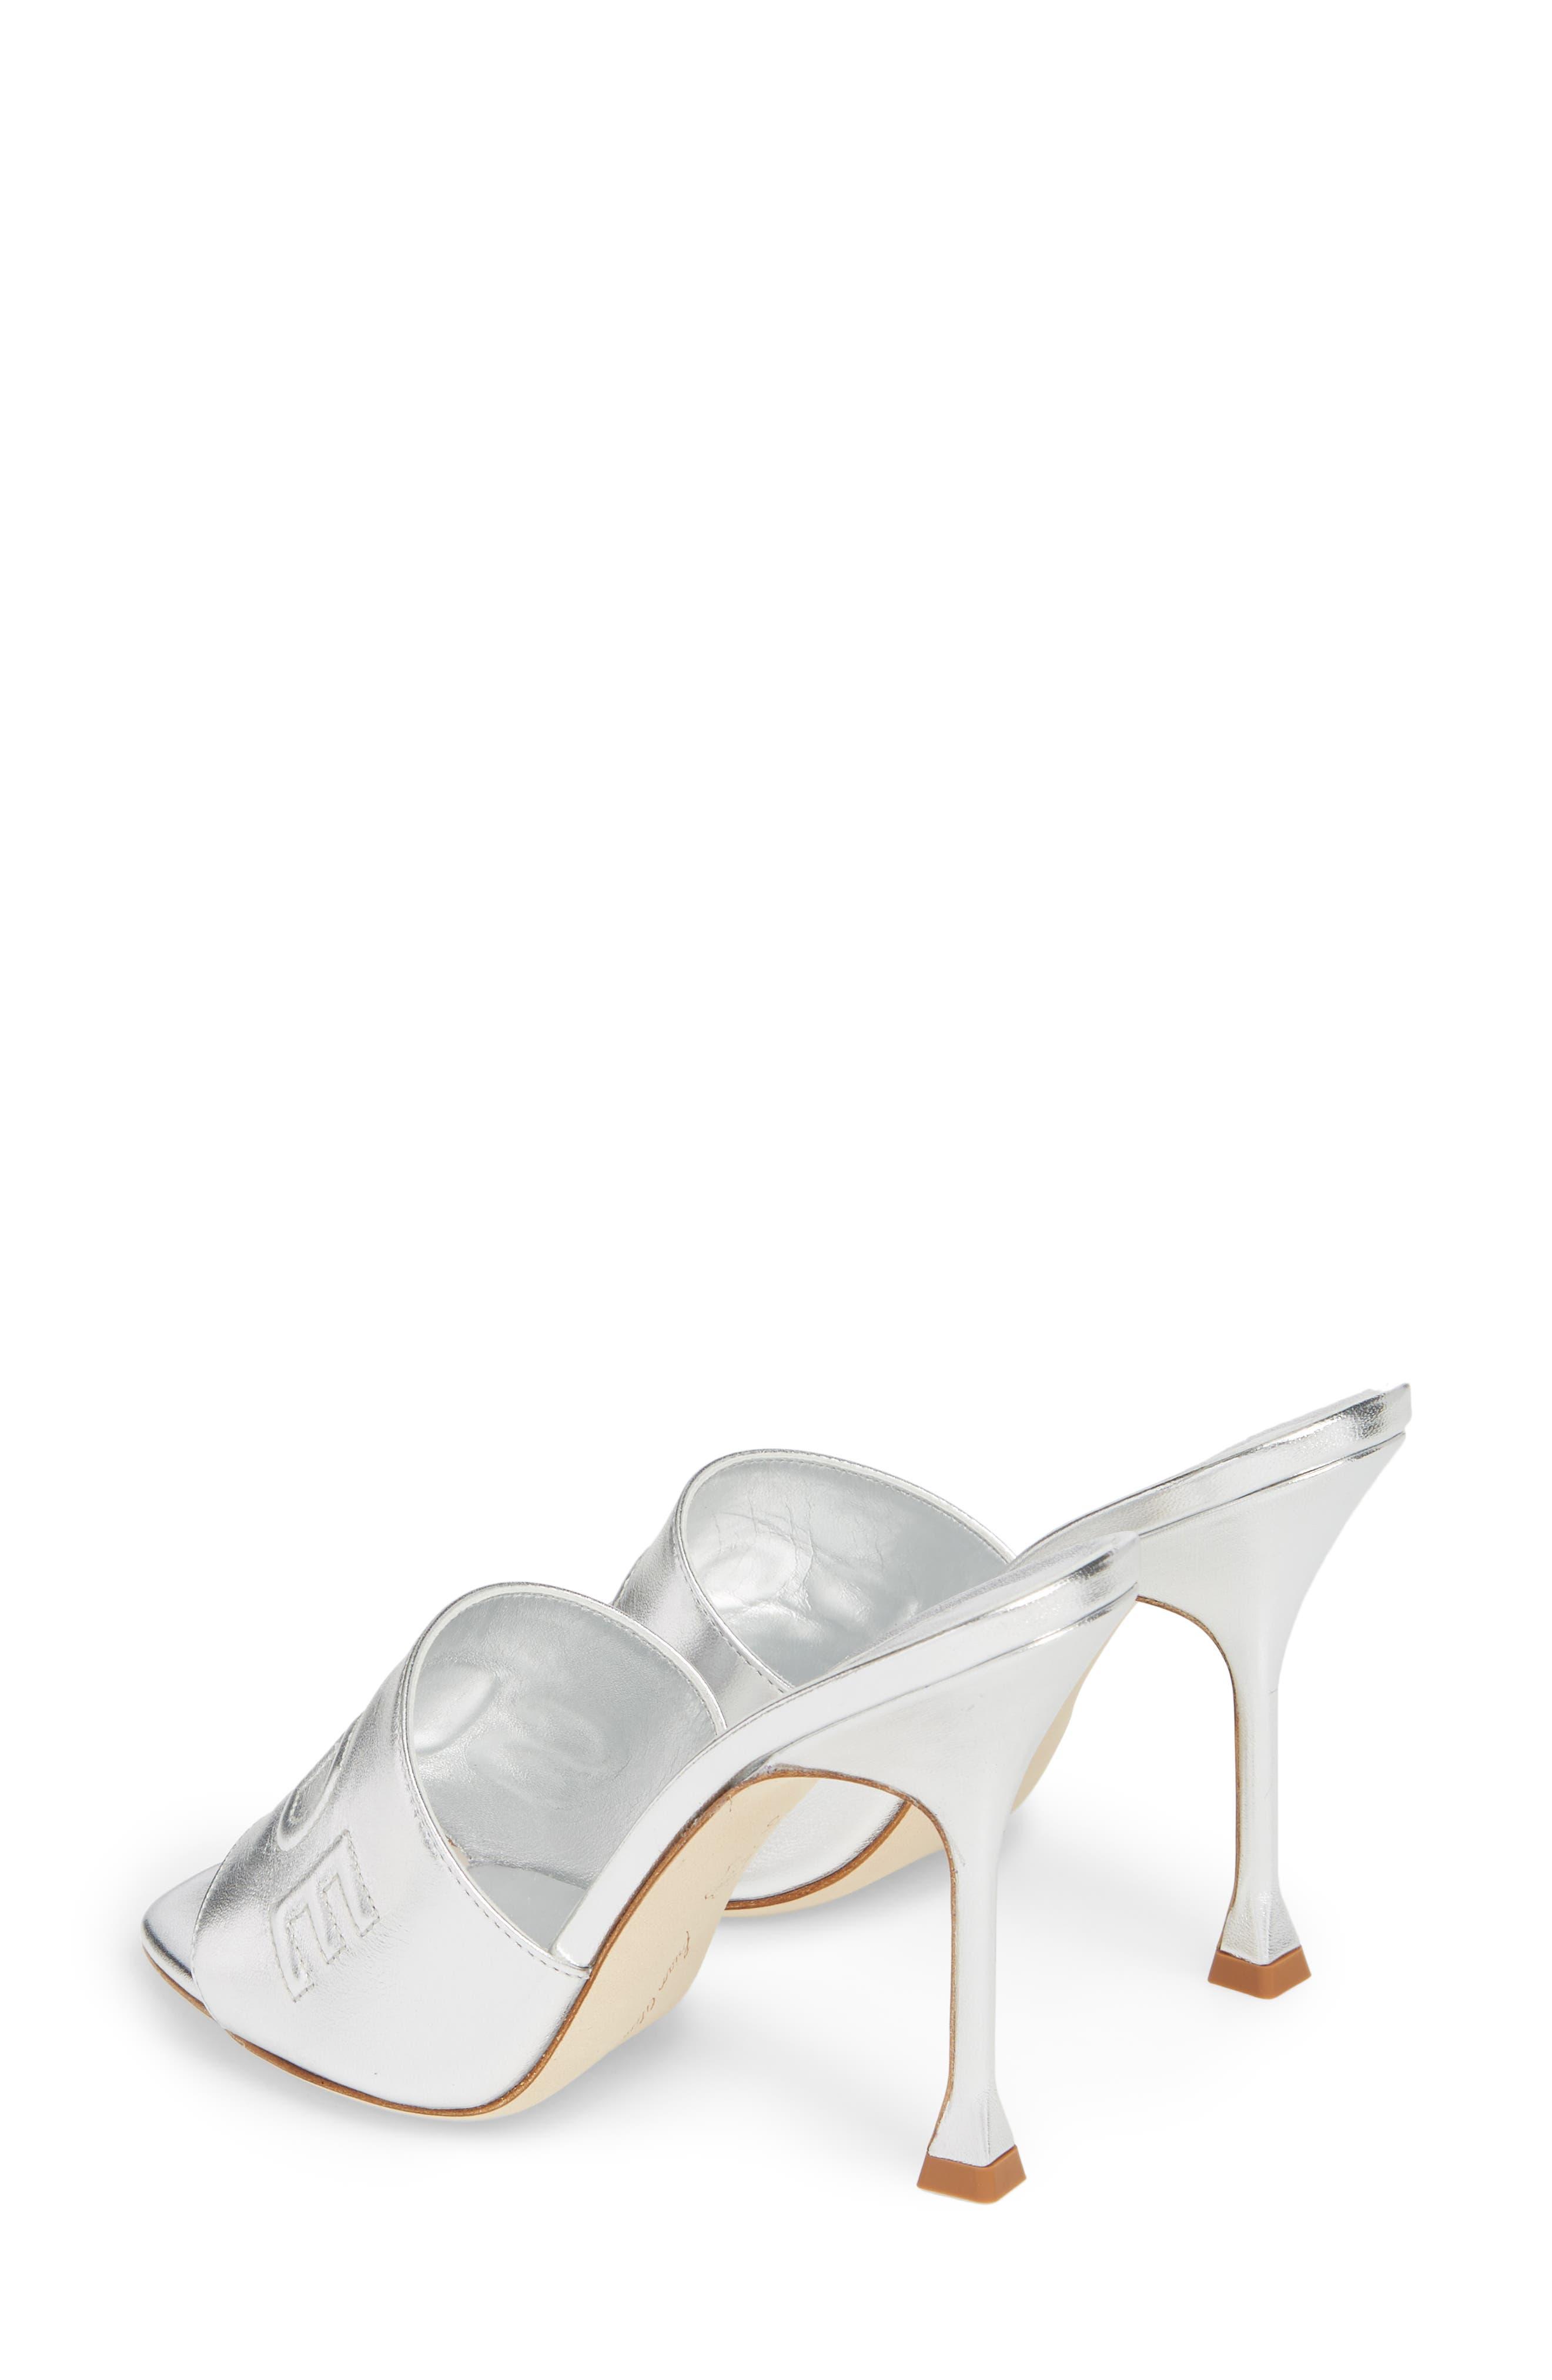 Spiagga Slide Sandal,                             Alternate thumbnail 3, color,                             SILVER METAL NAPPA